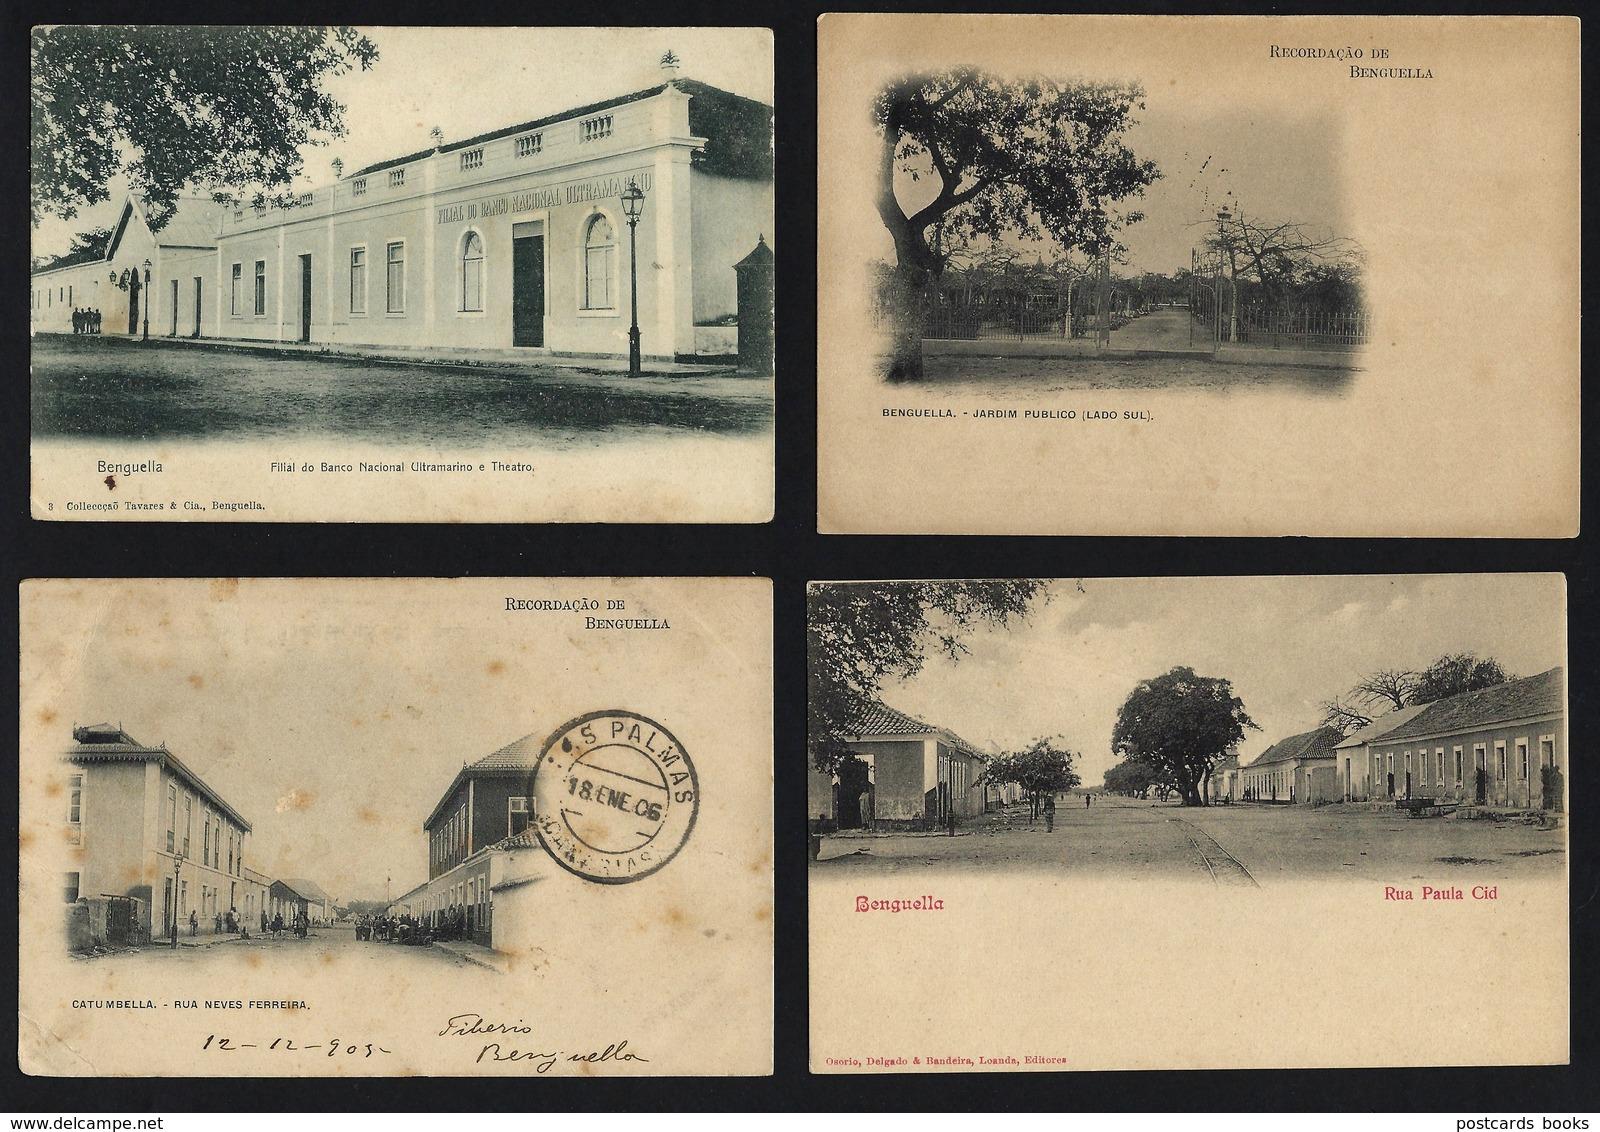 Conjunto 16 Postais BENGUELLA Benguela: Hotel, Banco, Alfandega. SET Of 16 Old Postcards ANGOLA 1900s AFRICA - Angola